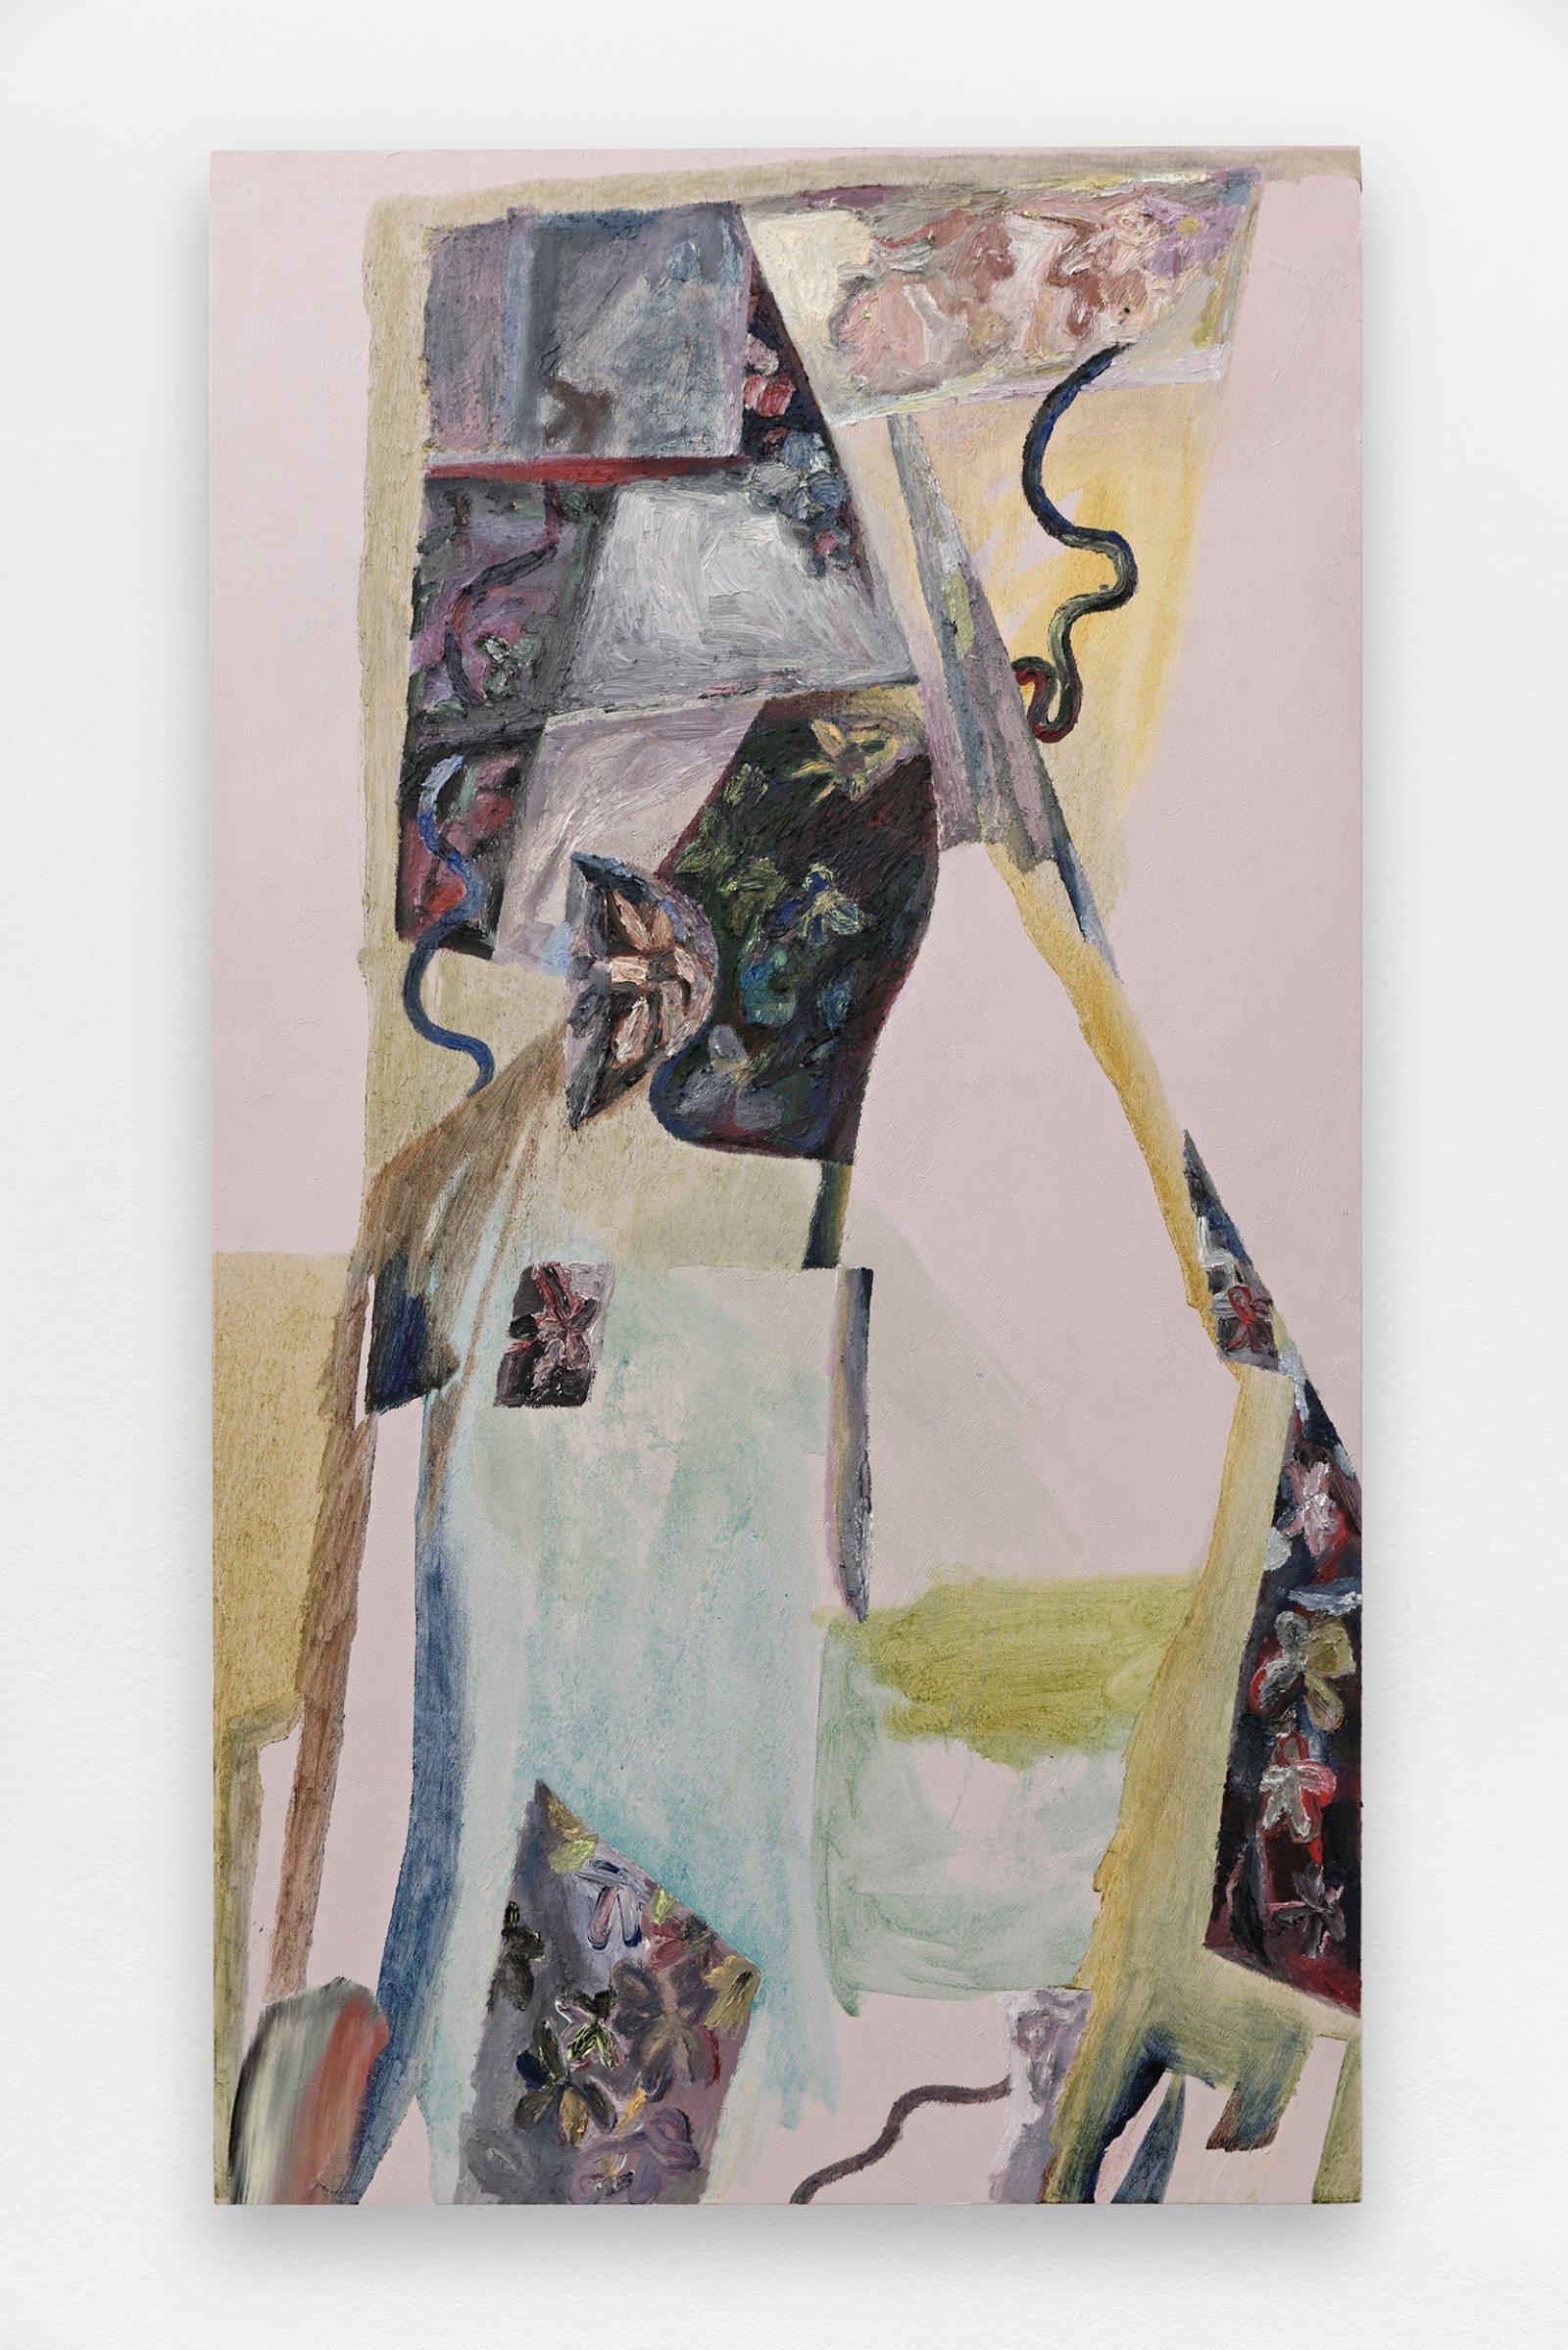 Rebecca Brewer, Vine Black, 2014, oil on panel, 42 x 24 in. (107 x 60 cm)